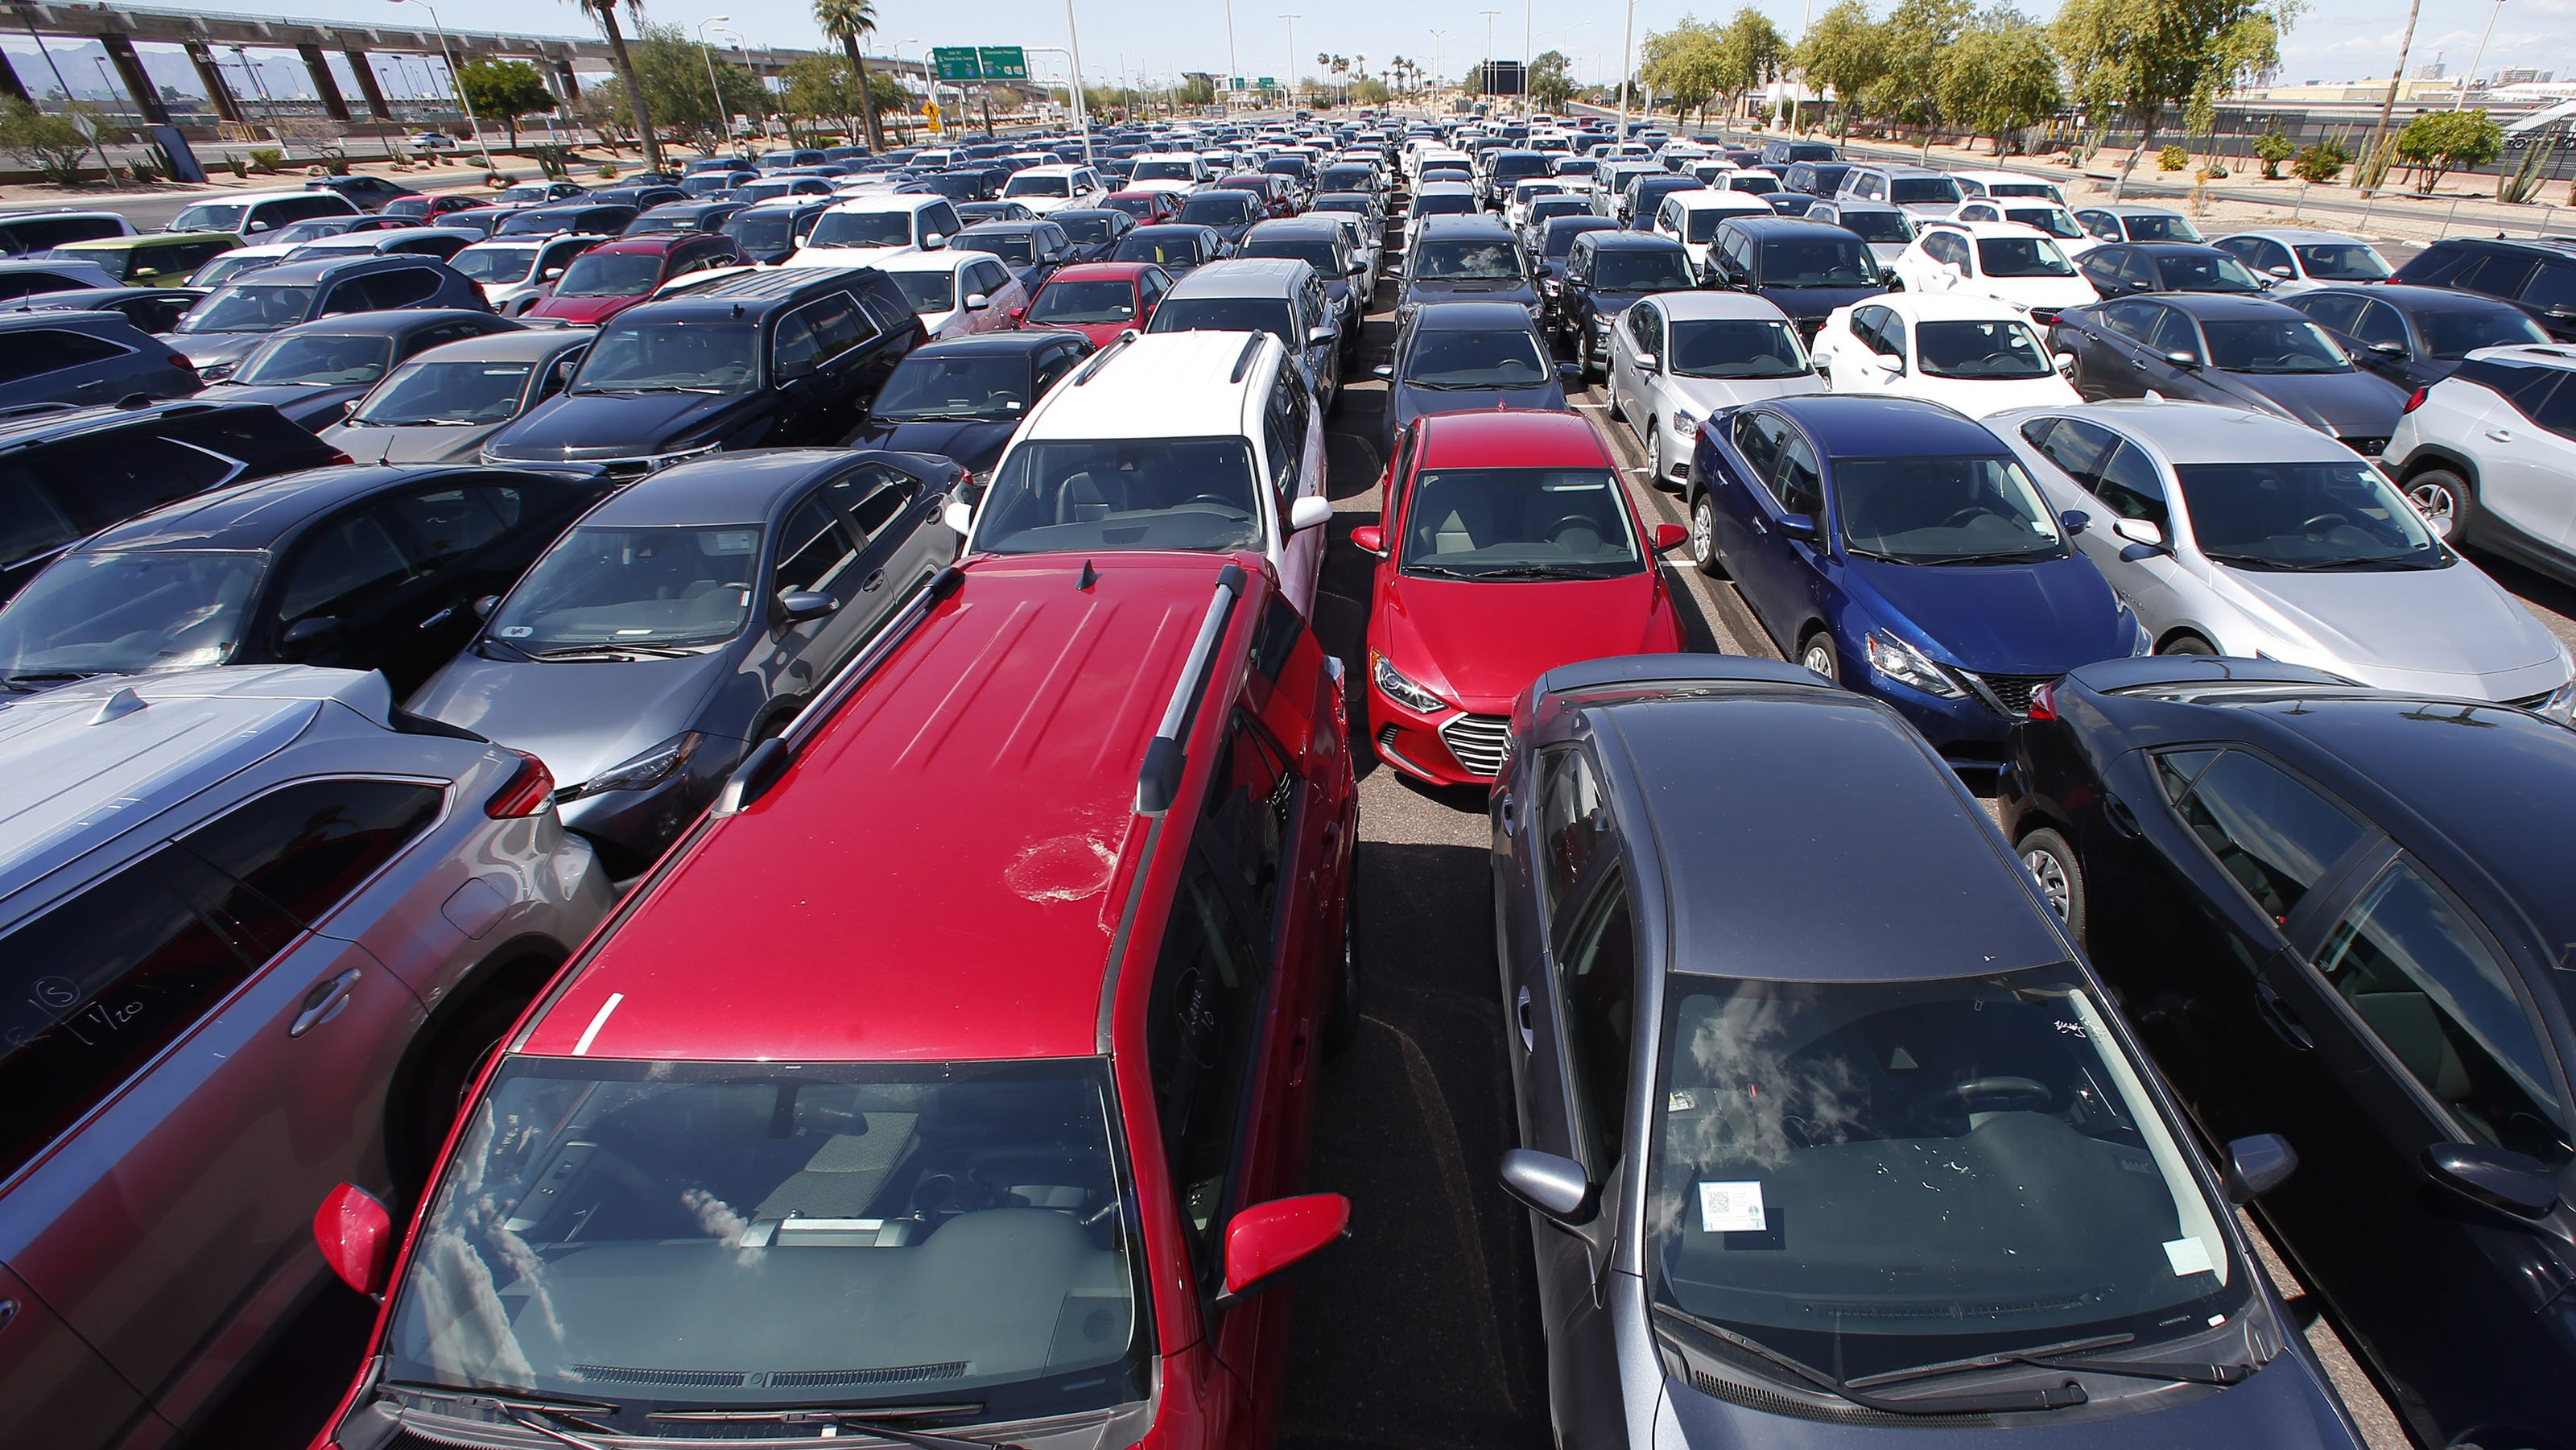 Coronavirus: Unused rental cars fill Phoenix airport parking lots